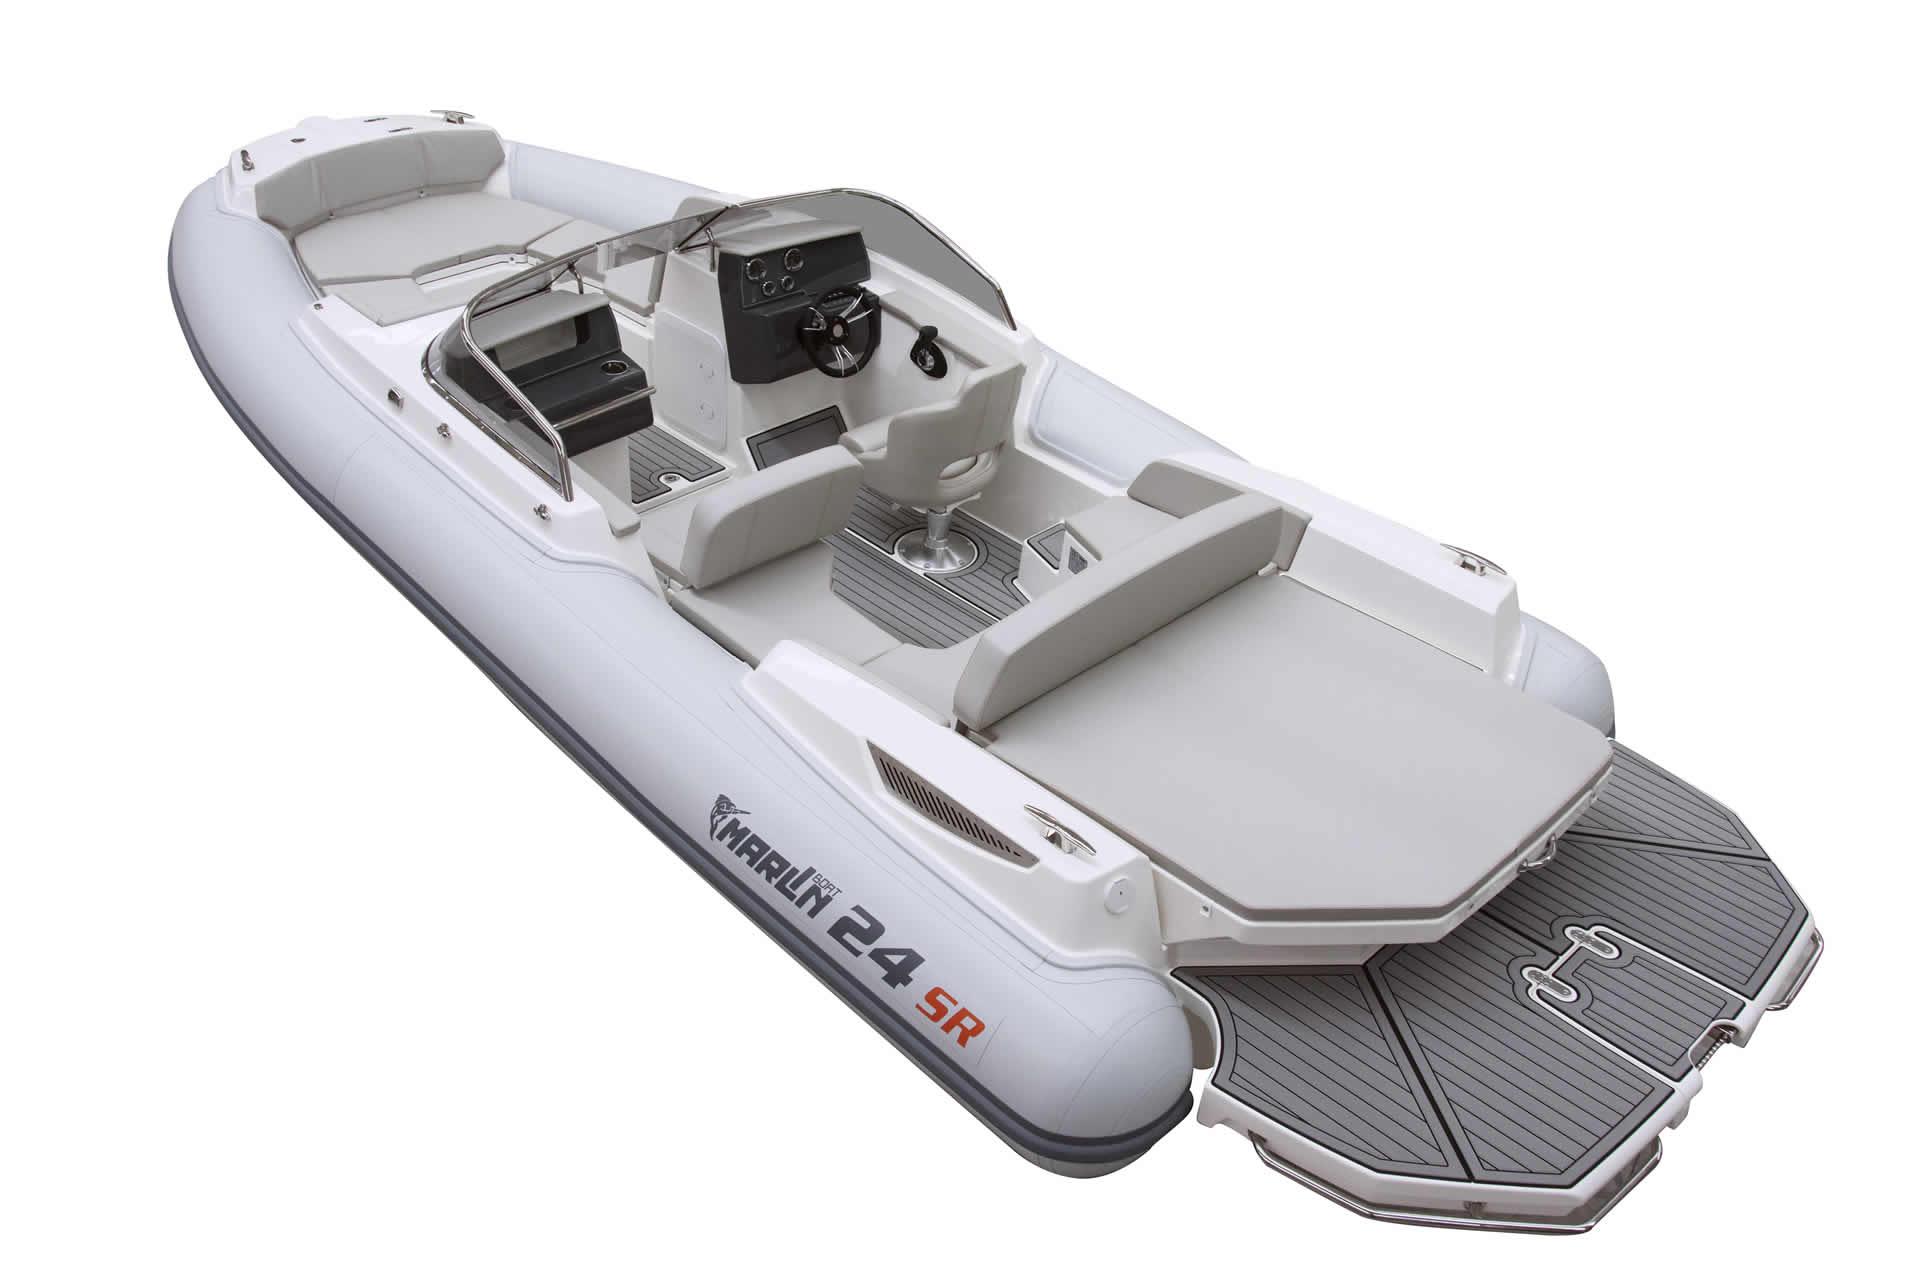 Boats list - MANO MARINE SPORT FISH 2250   Sirena 37 5 - page 1